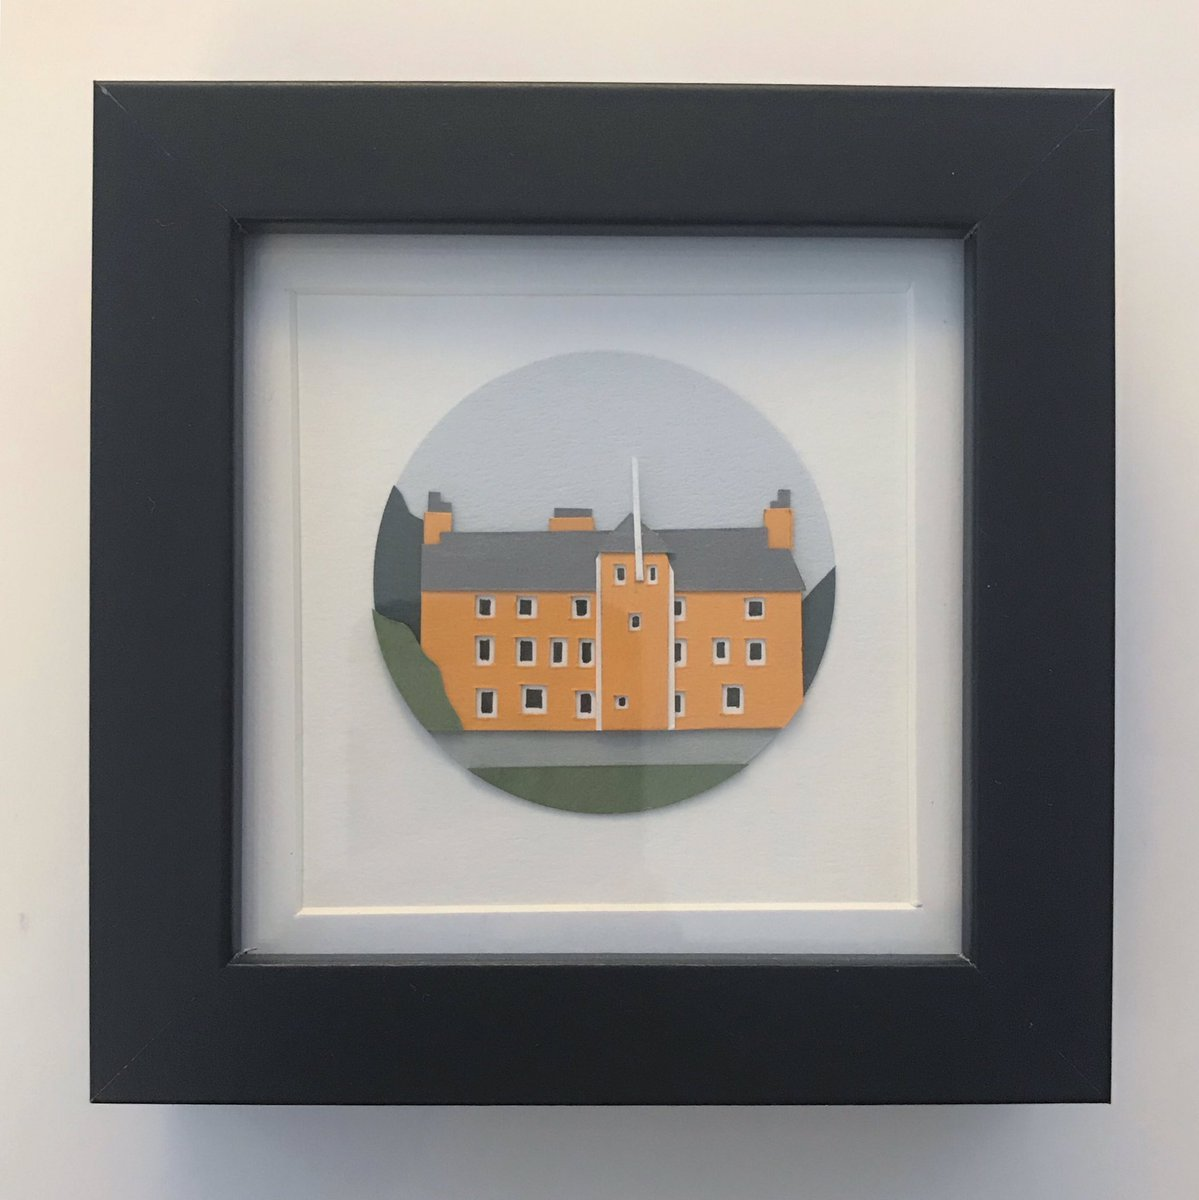 Another recent landscape miniature make : Pittencrief House - I love a visit to the glen !! #artist #design #handmadehour #paperart #papercraft #paperartist #papercut #landscape #architecture #etsy #etsyseller #miniatures #sale